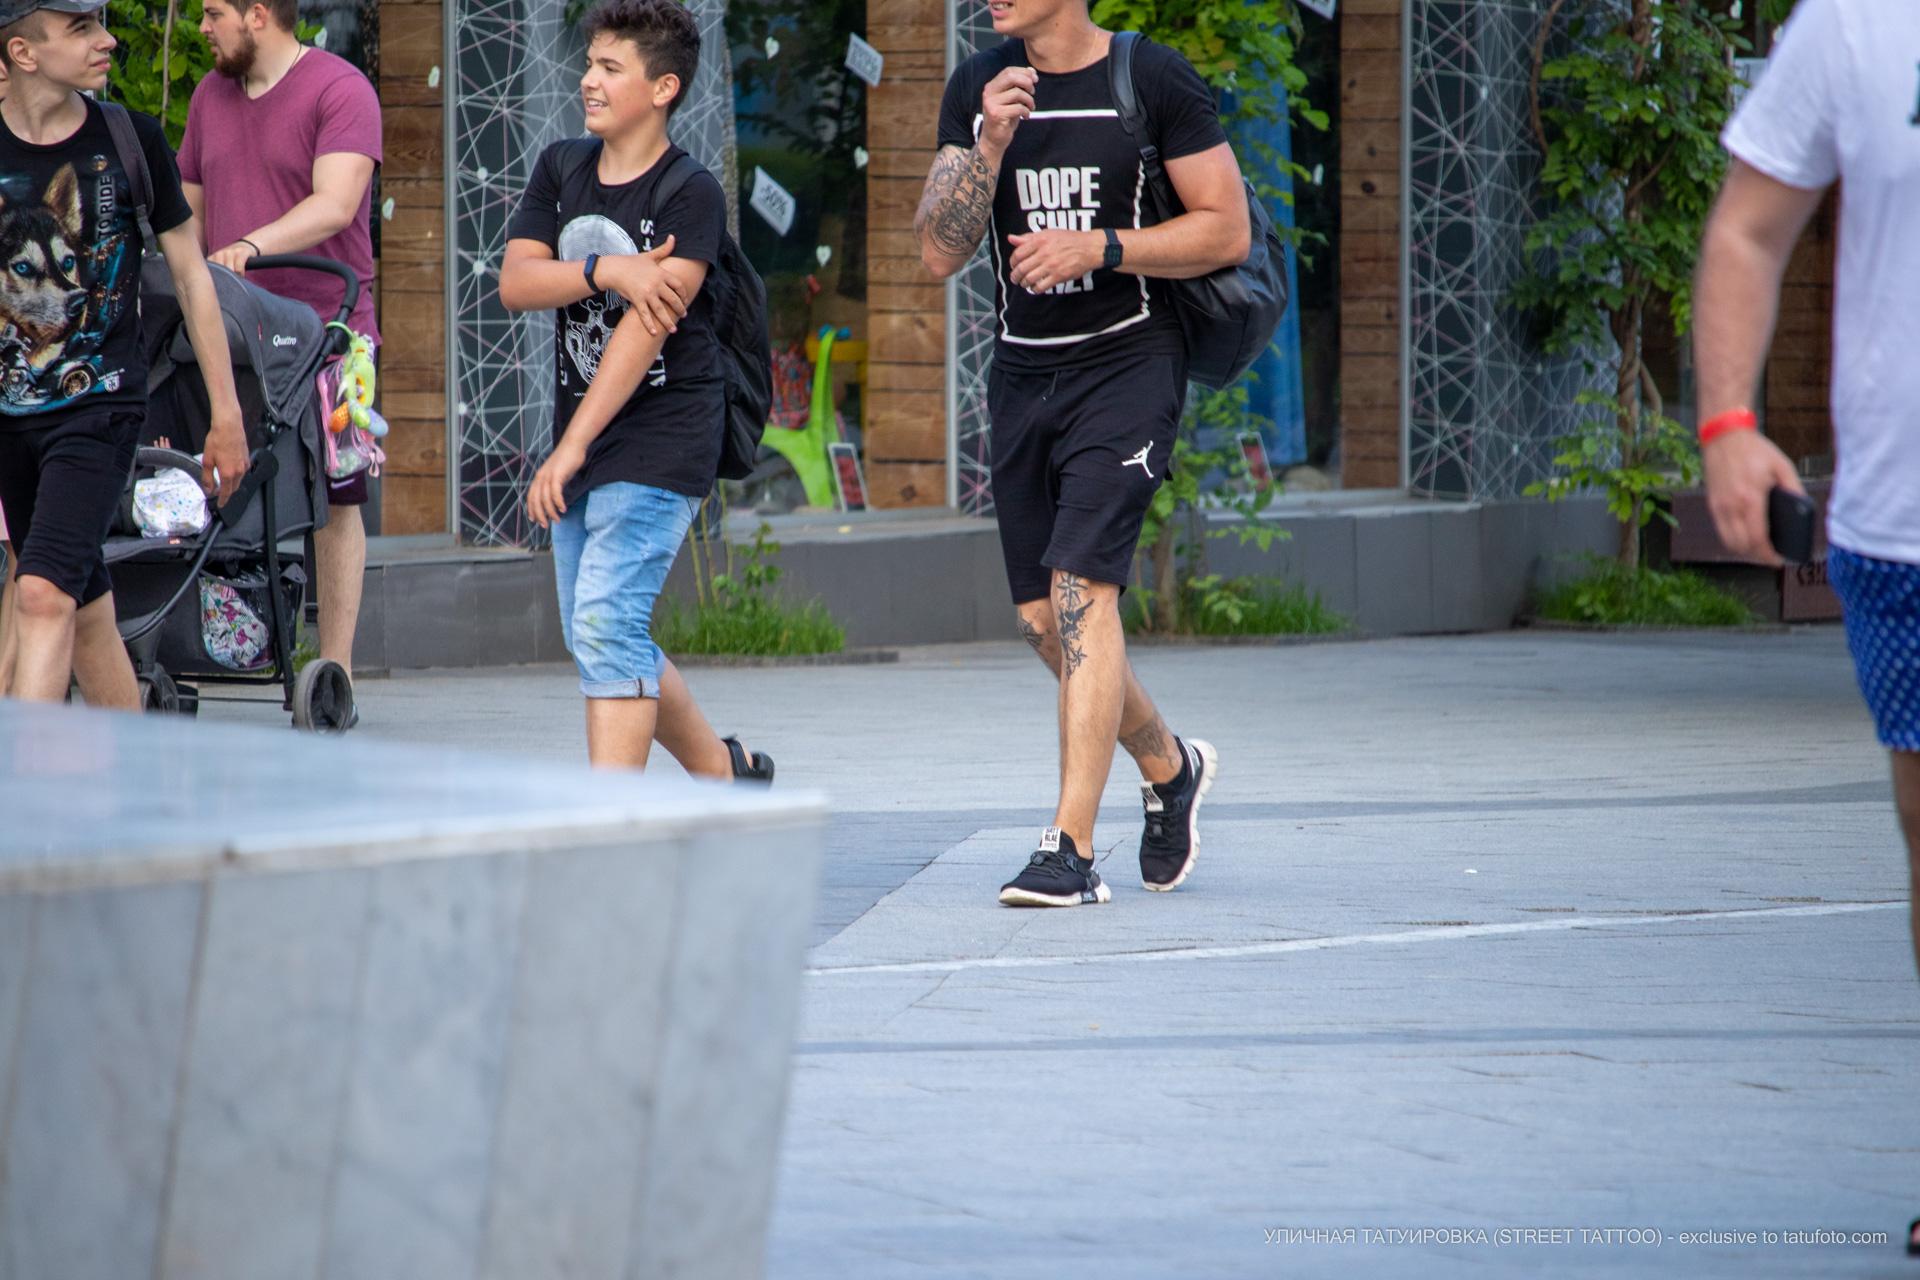 Фото тату со звездами на коленях у молодого парня – Уличная татуировка (street tattoo) № 06 – 18.06.2020 – tatufoto.com